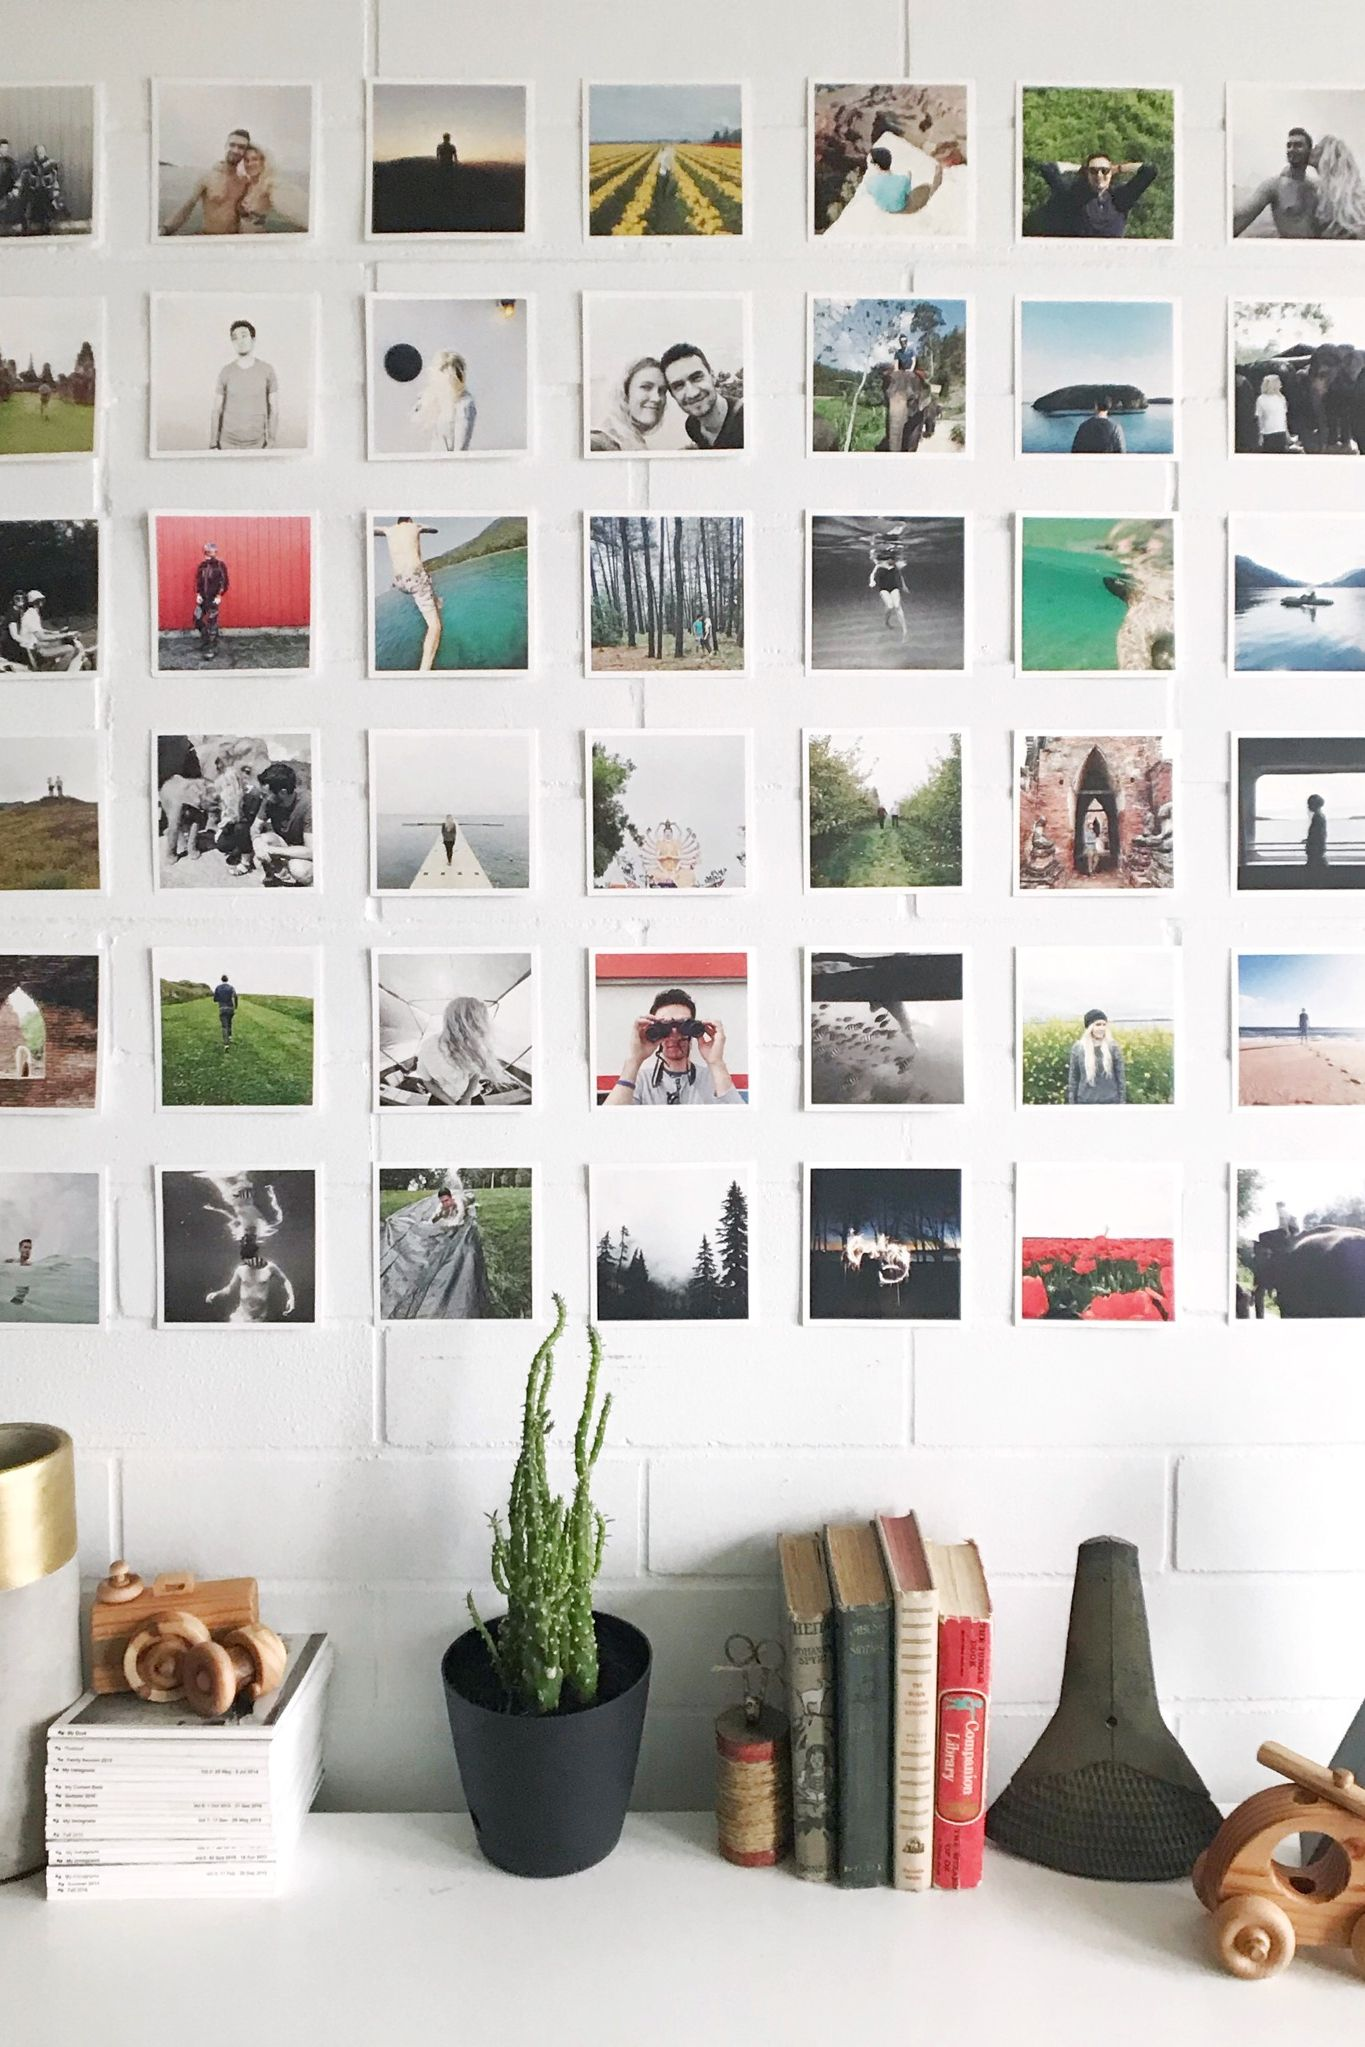 Square Photo Prints Print Instagram Photos Square Photo Prints Photo Wall Display Print Instagram Photos